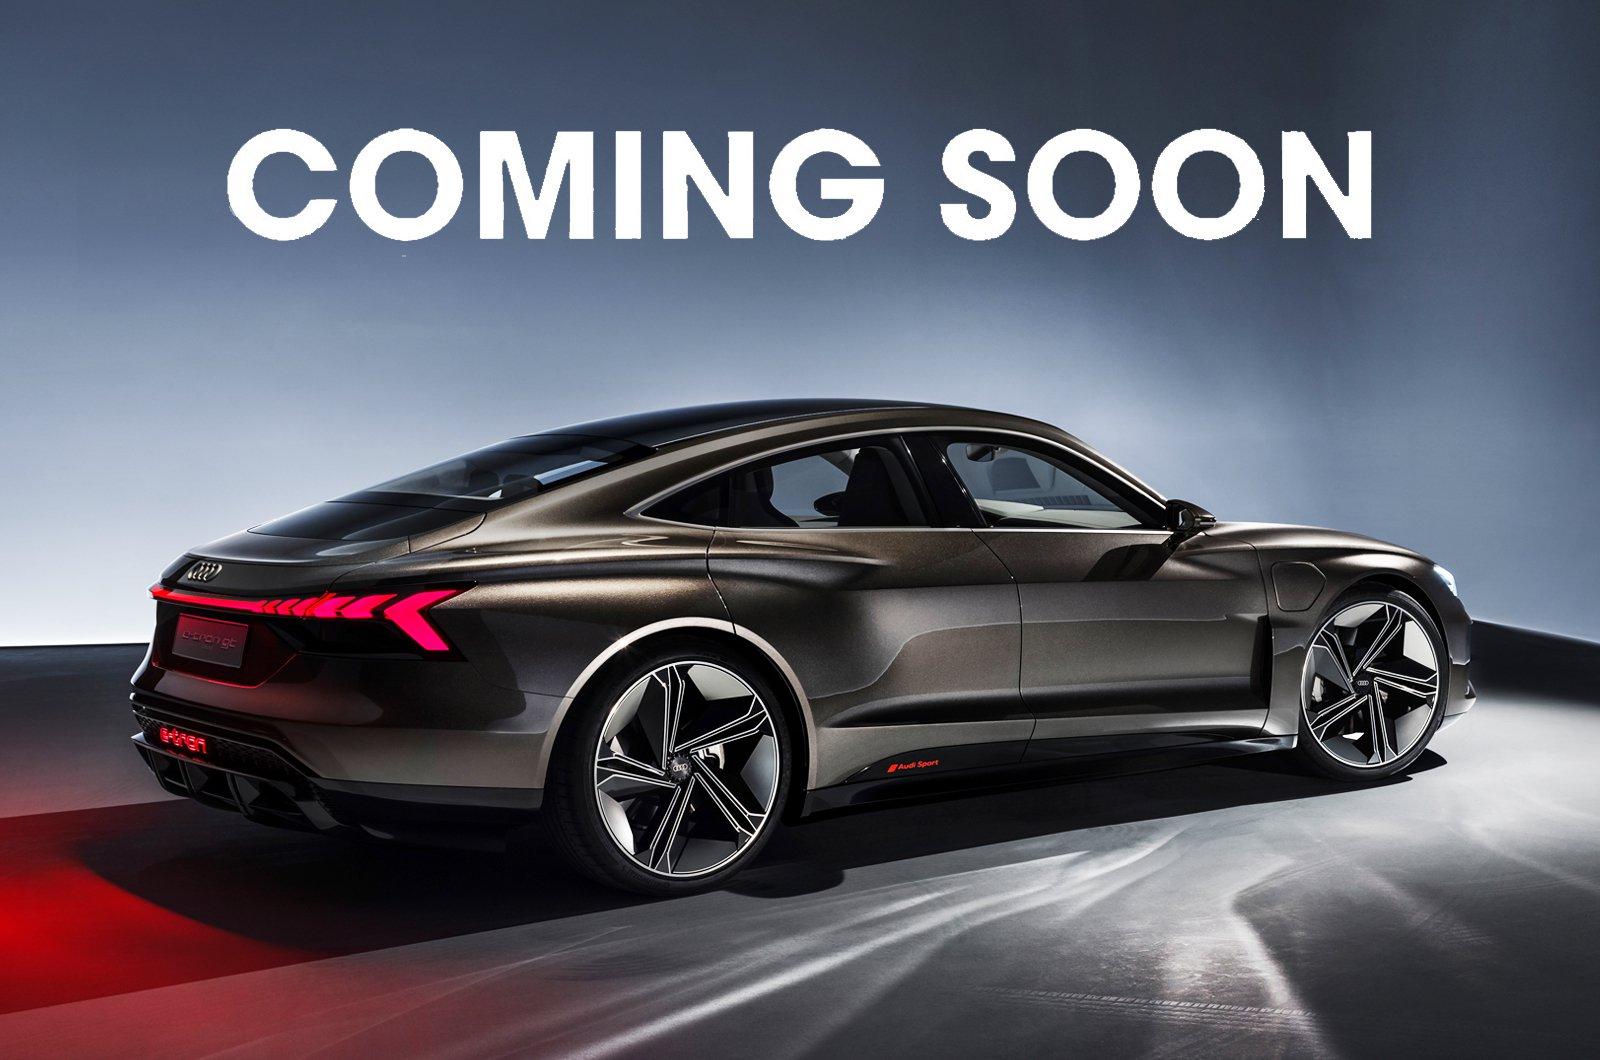 Coming soon - Audi E-tron GT